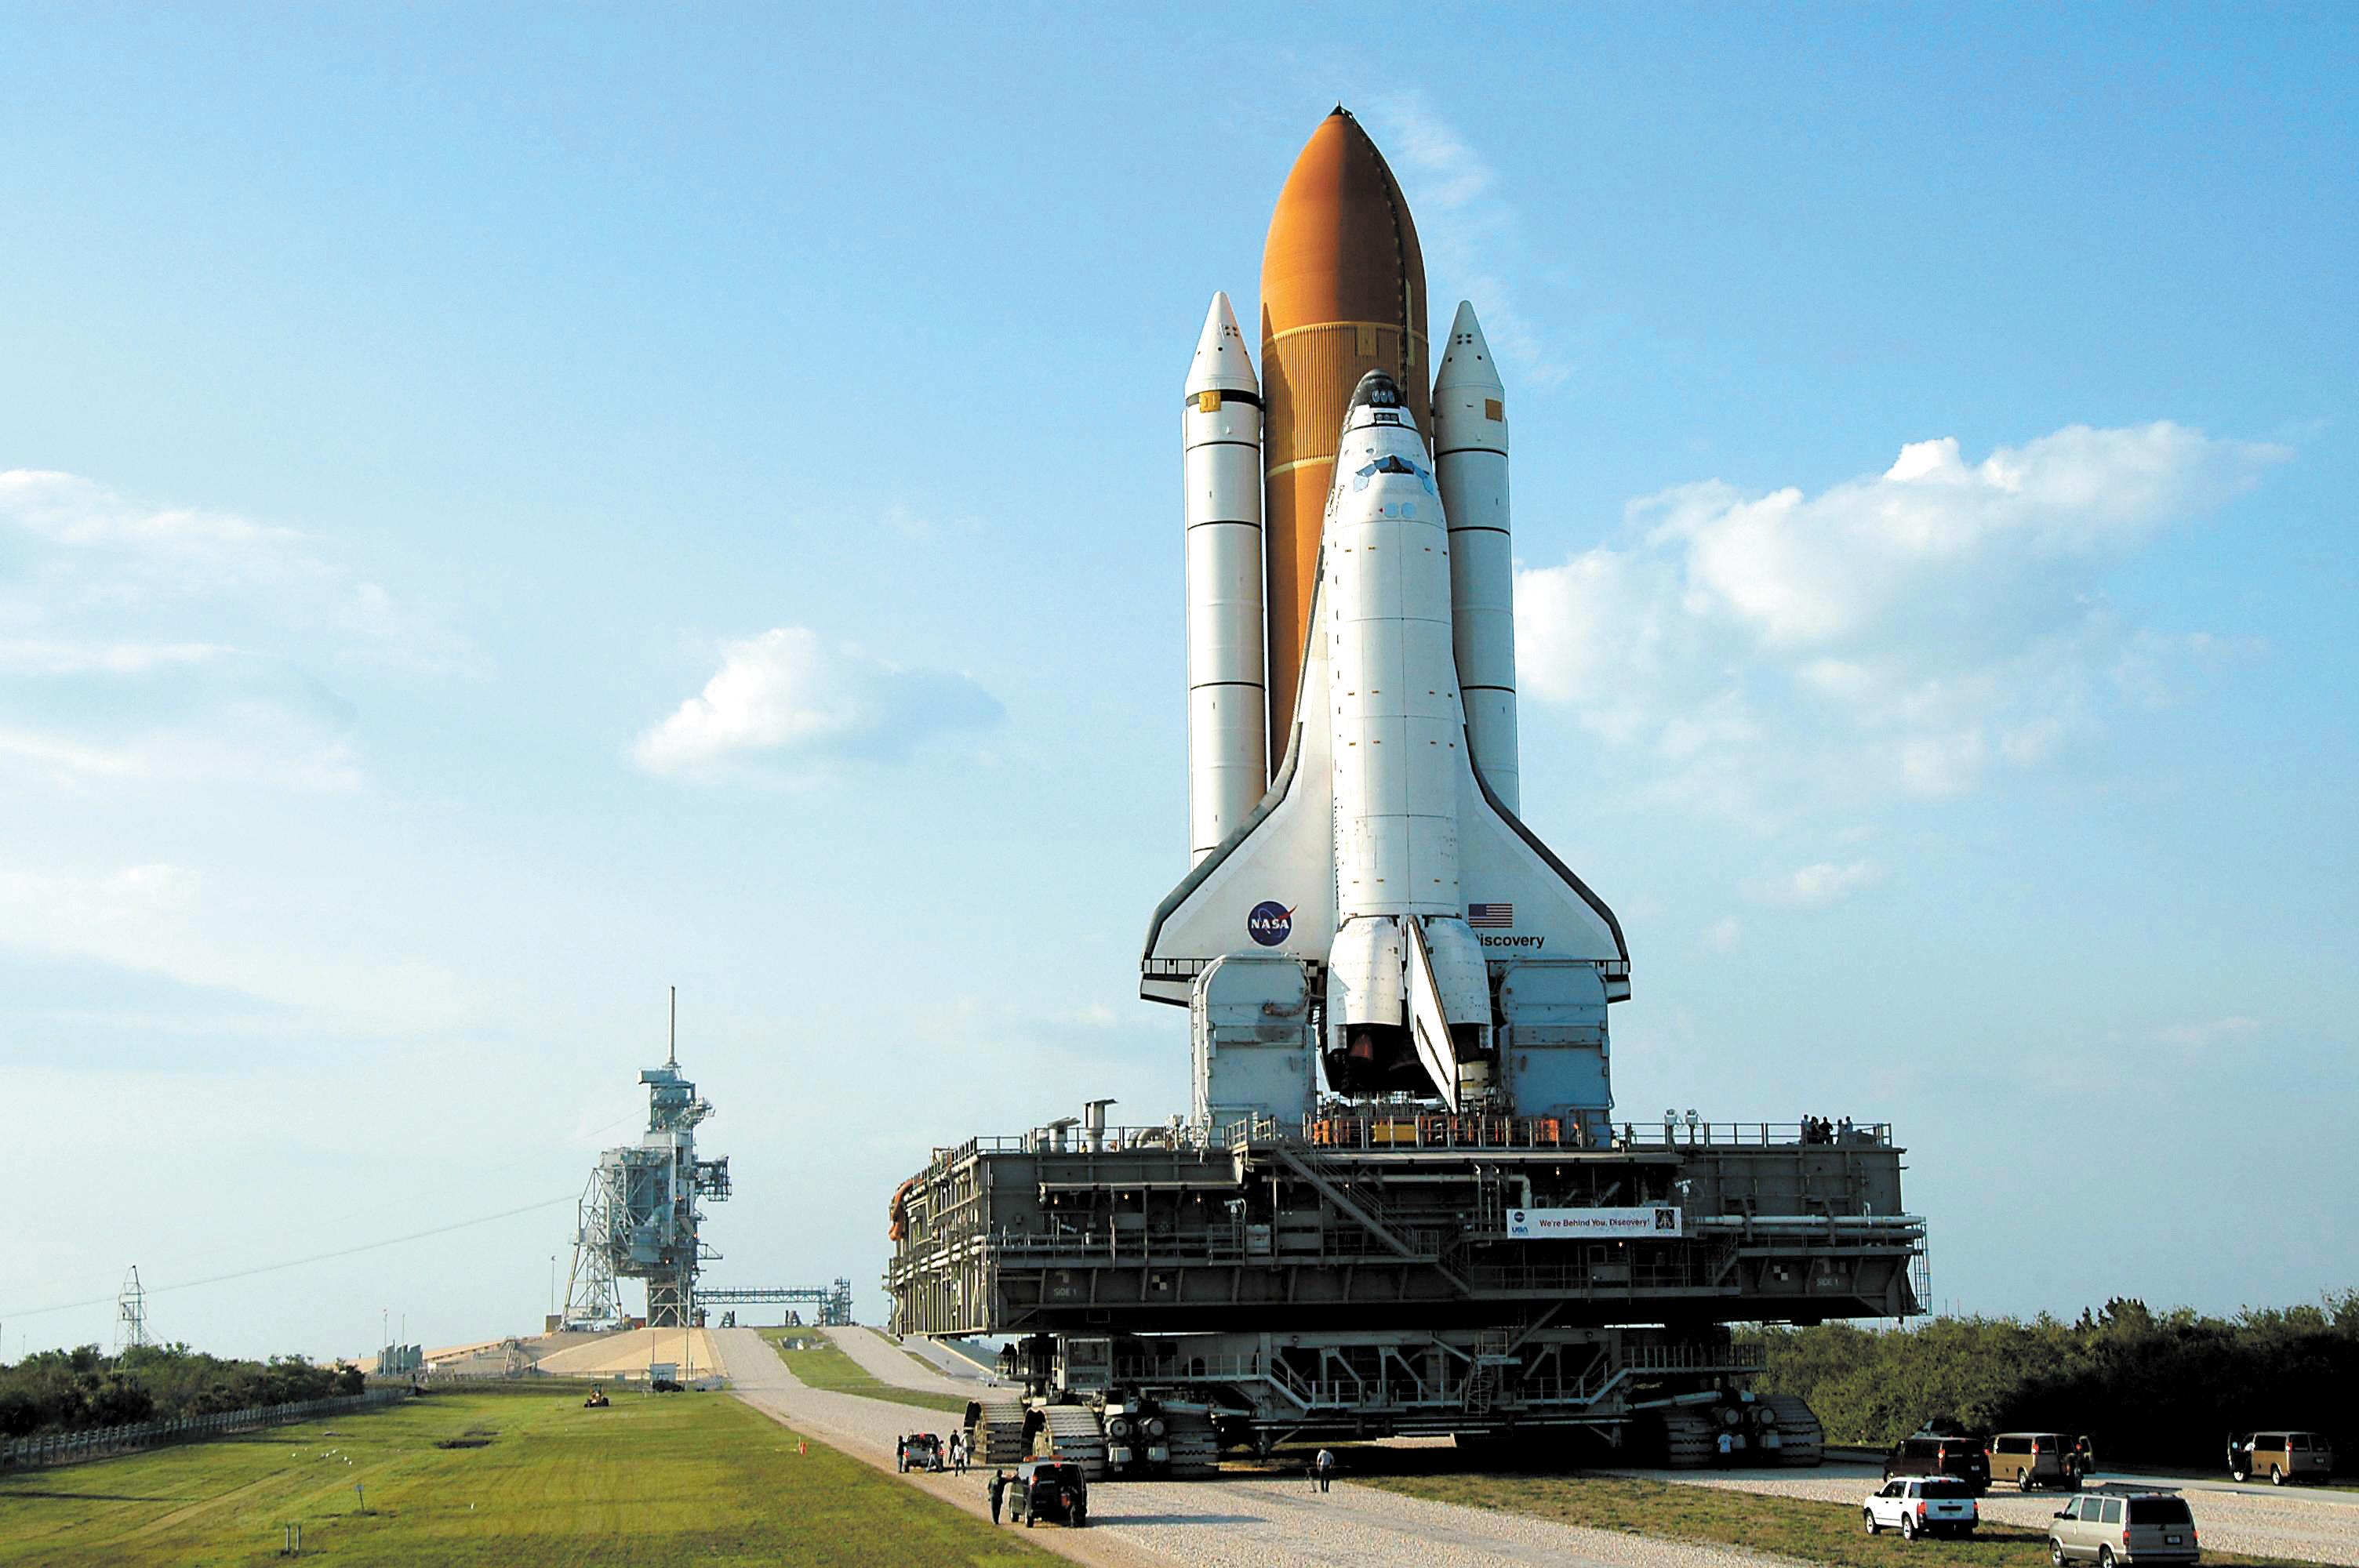 Space Shuttle Launch Wallpaper - WallpaperSafari